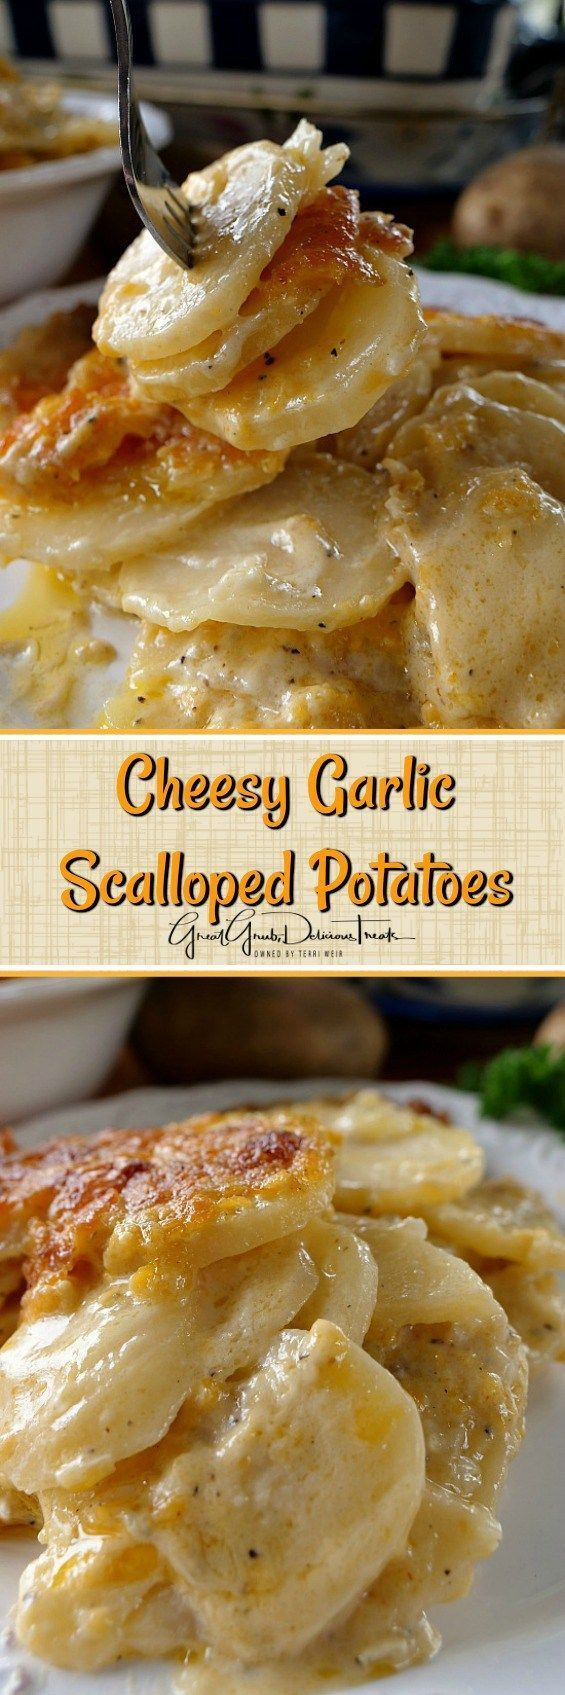 scalloped cheesy garlic potatoes. easy delicious fast recipes.